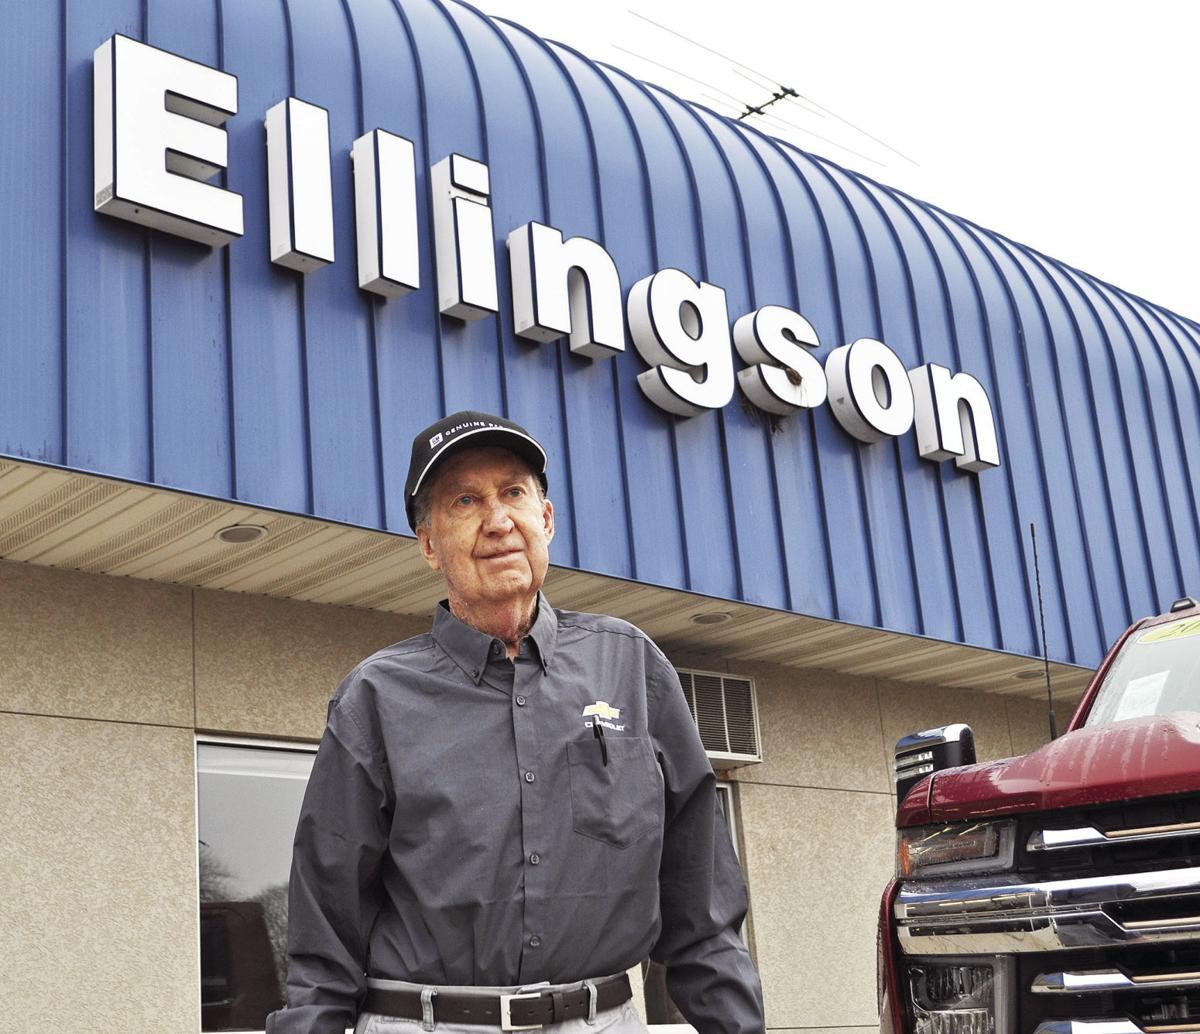 Chuck Ellingson